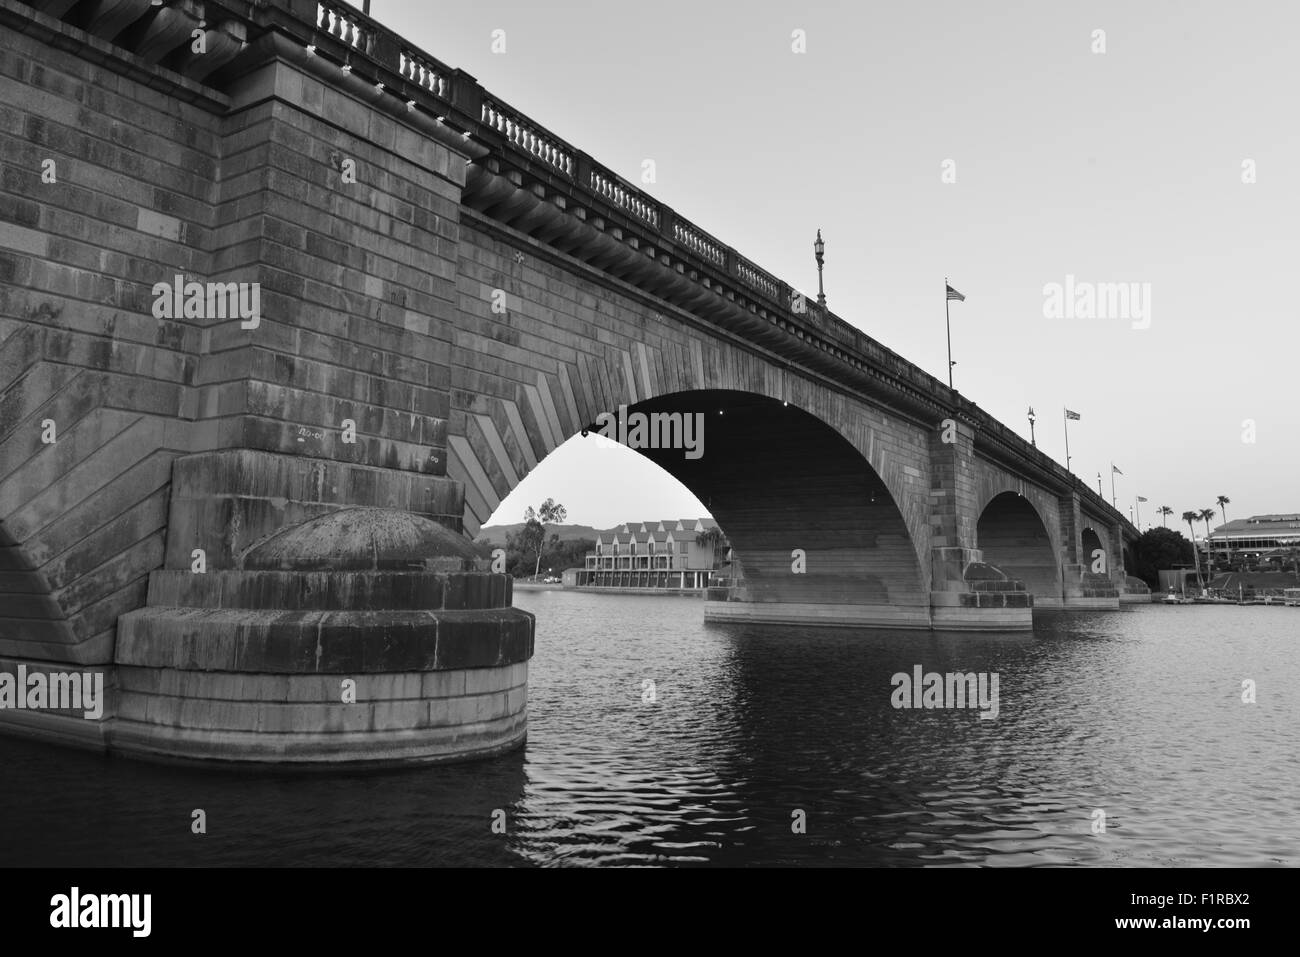 London Bridge at sunrise at Lake Havasu - Stock Image